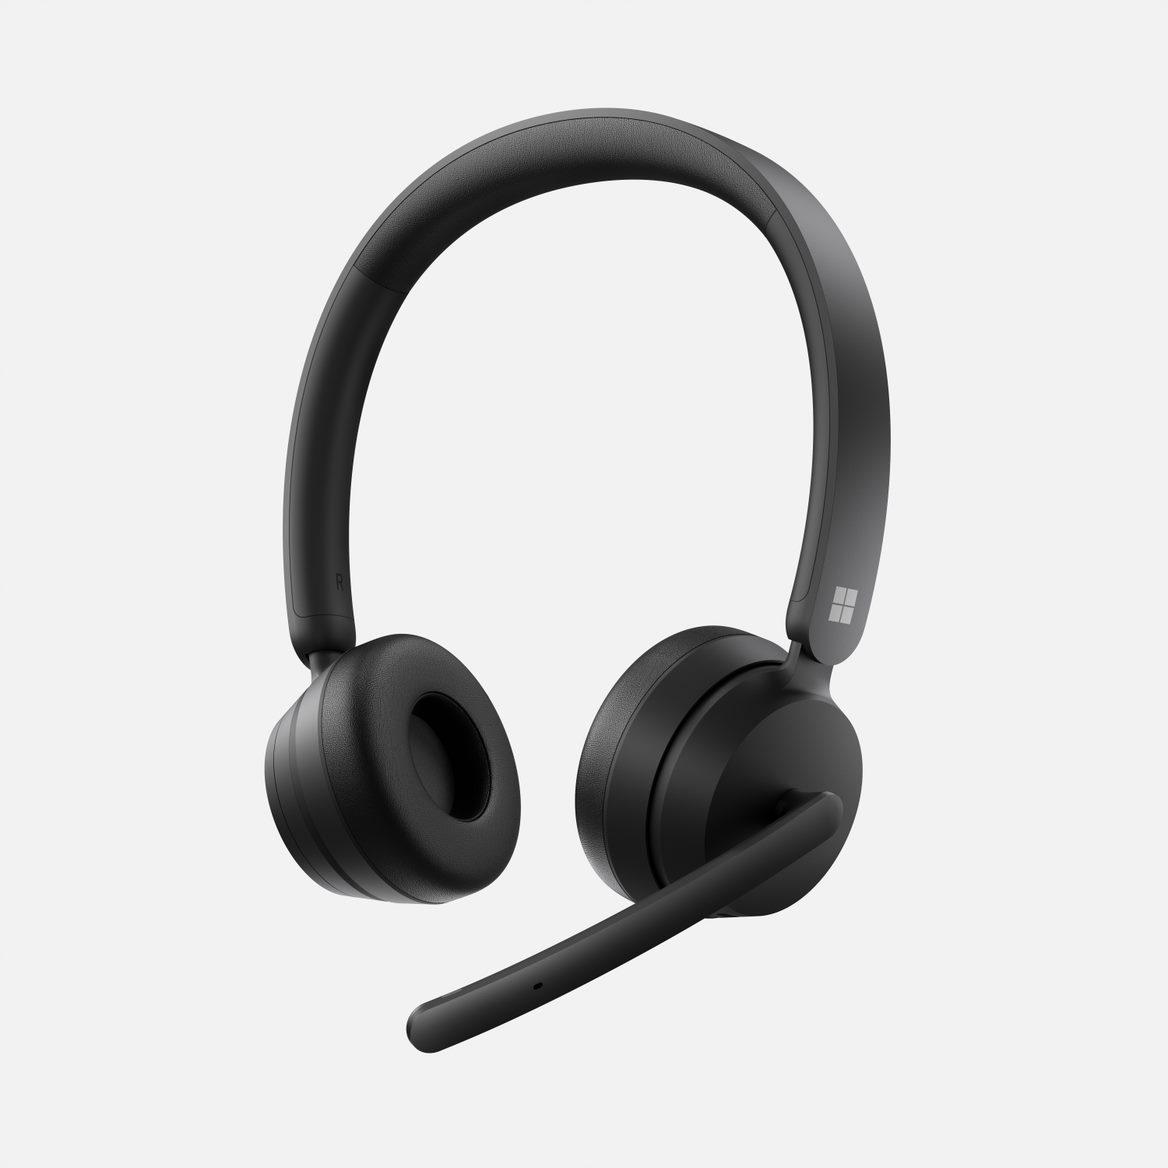 Microsoft Modern Wireless Headset, Black - 8JR-00011